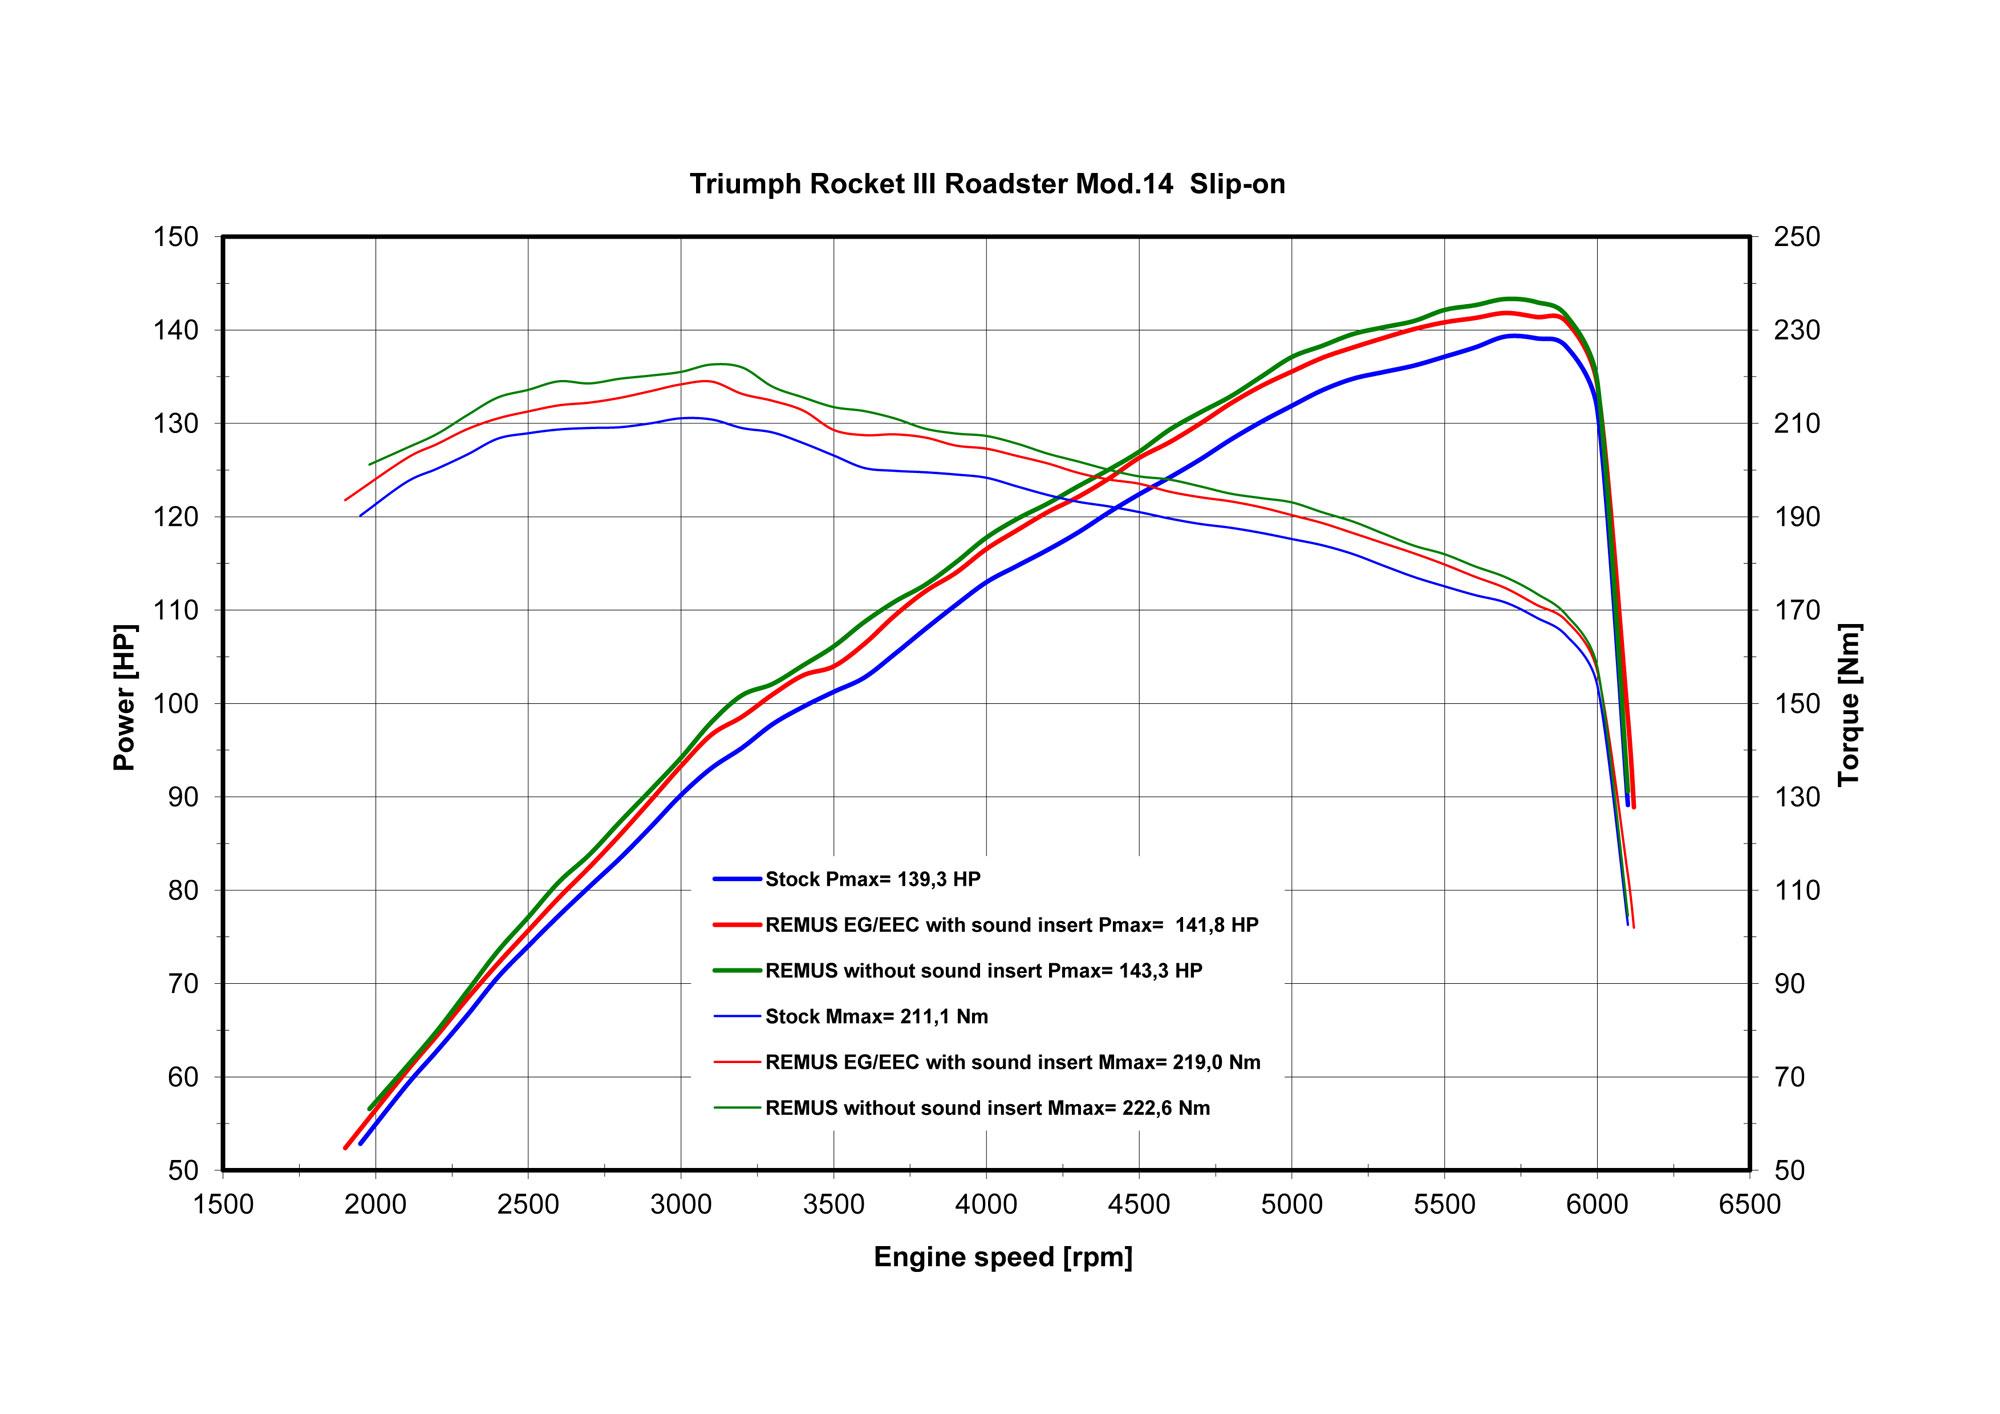 hight resolution of rocket iii touring wiring diagram simple wiring postrocket iii touring wiring diagram wiring library triumph rocket